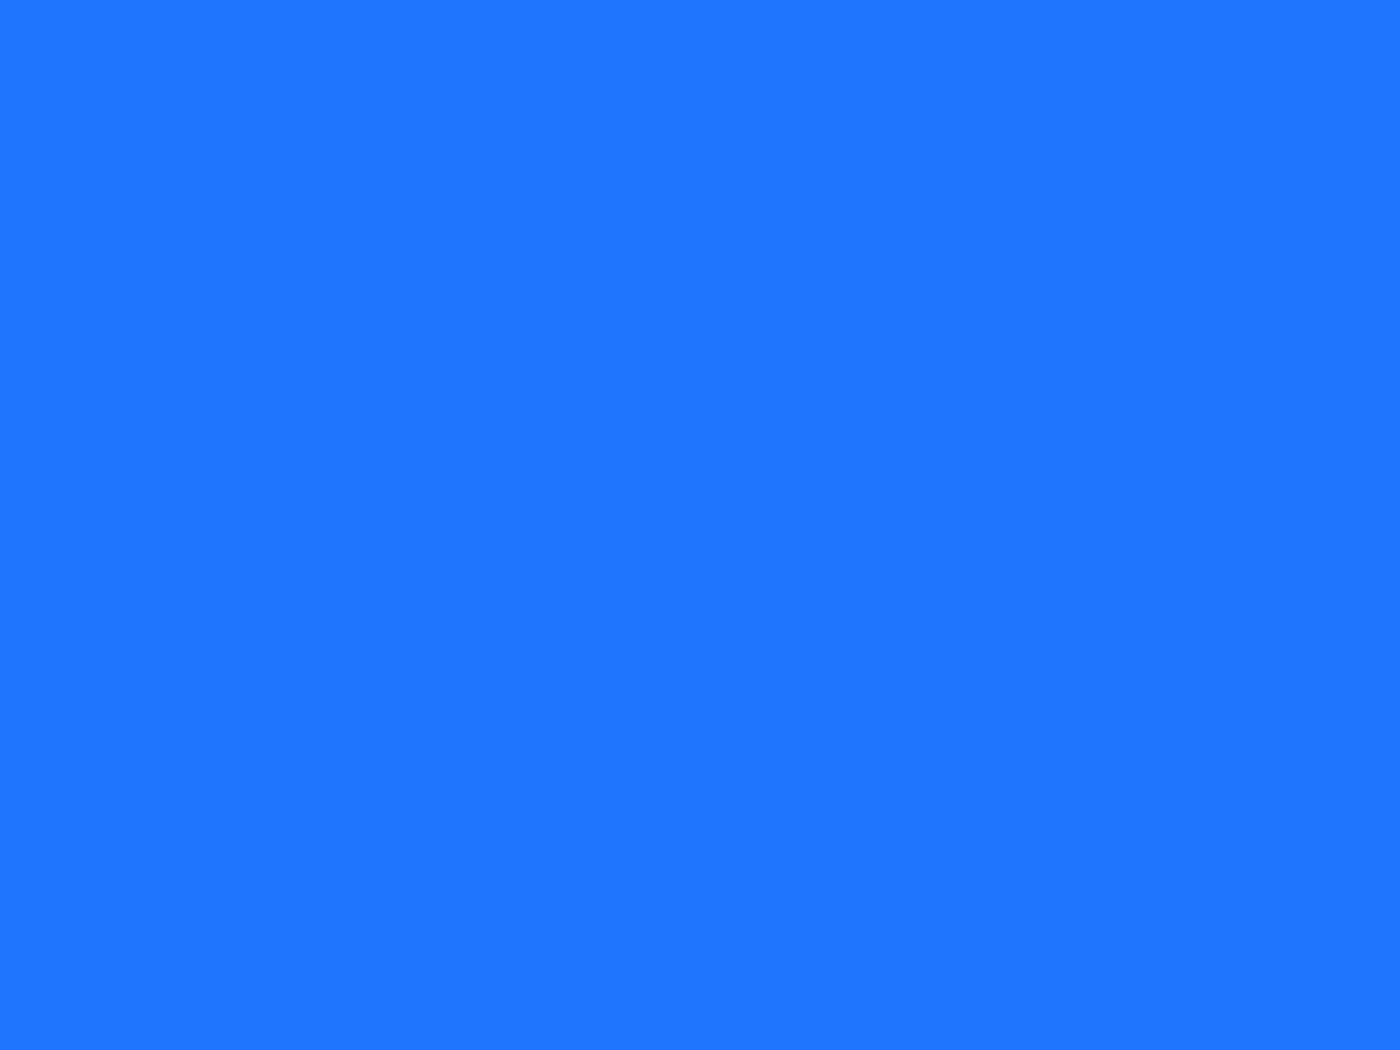 1400x1050 Blue Crayola Solid Color Background